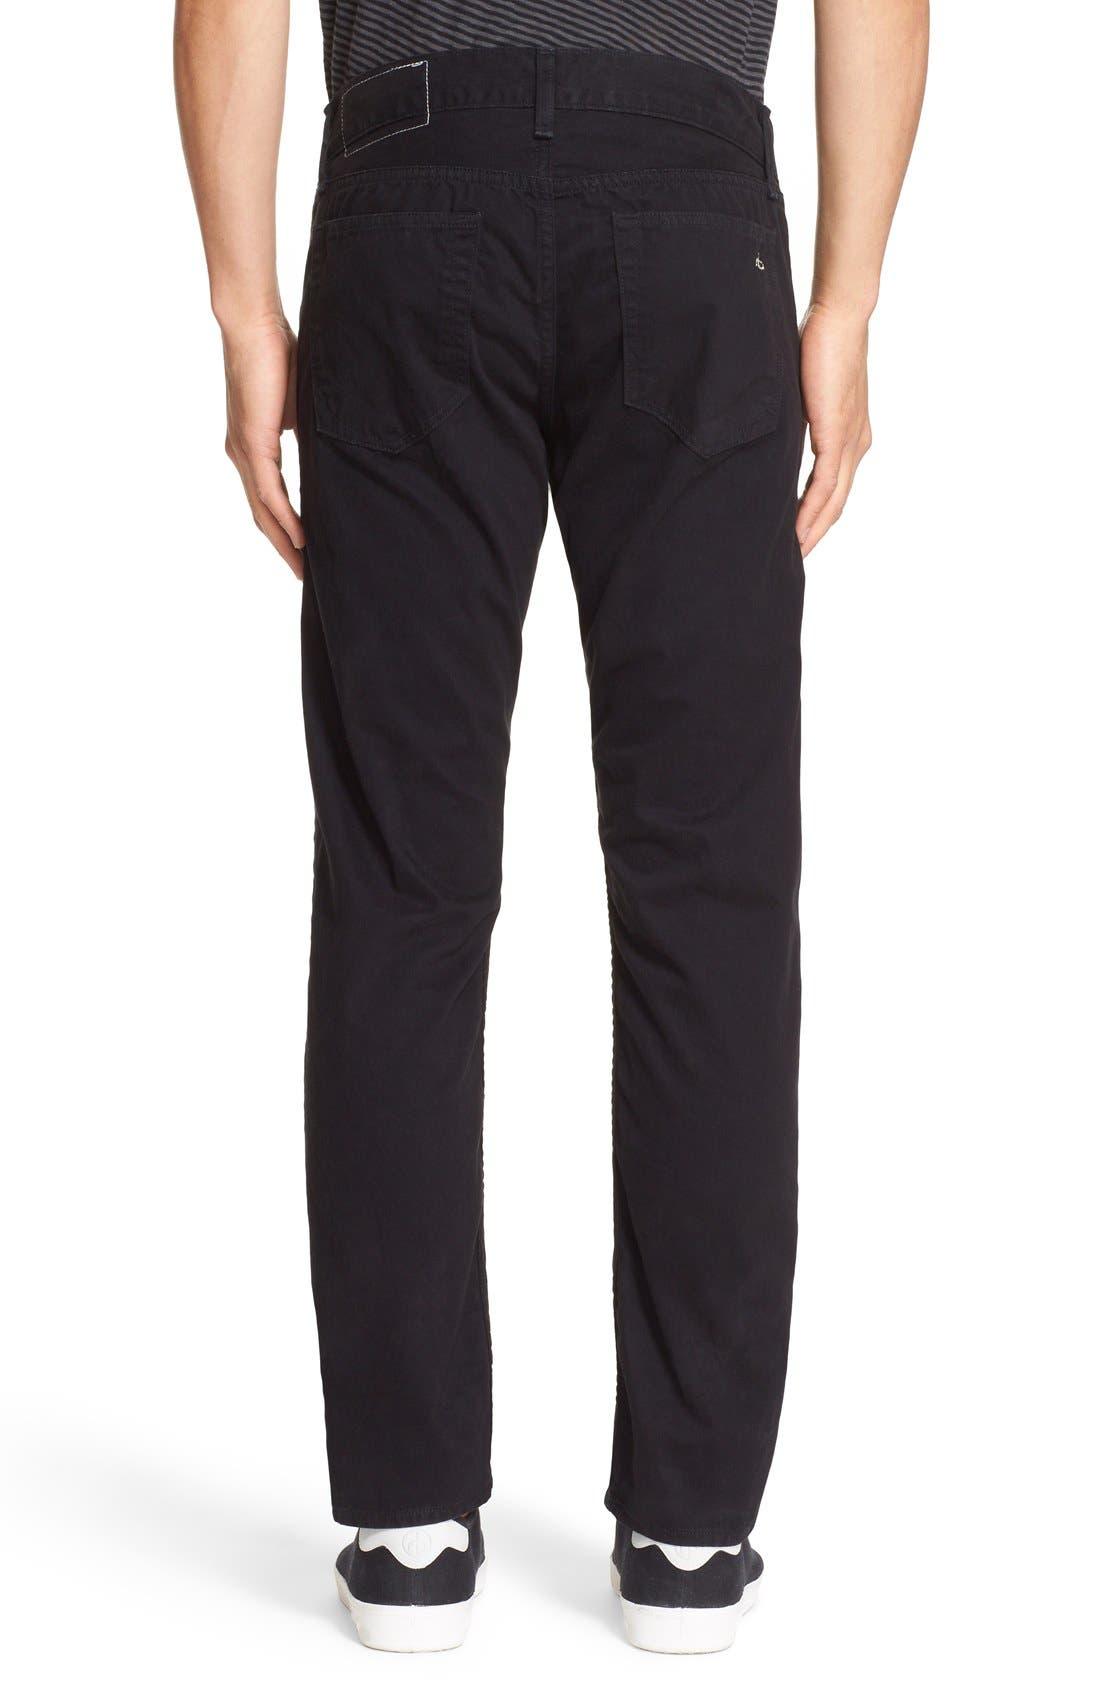 'Fit 2' Cotton Twill Pants,                             Alternate thumbnail 2, color,                             001